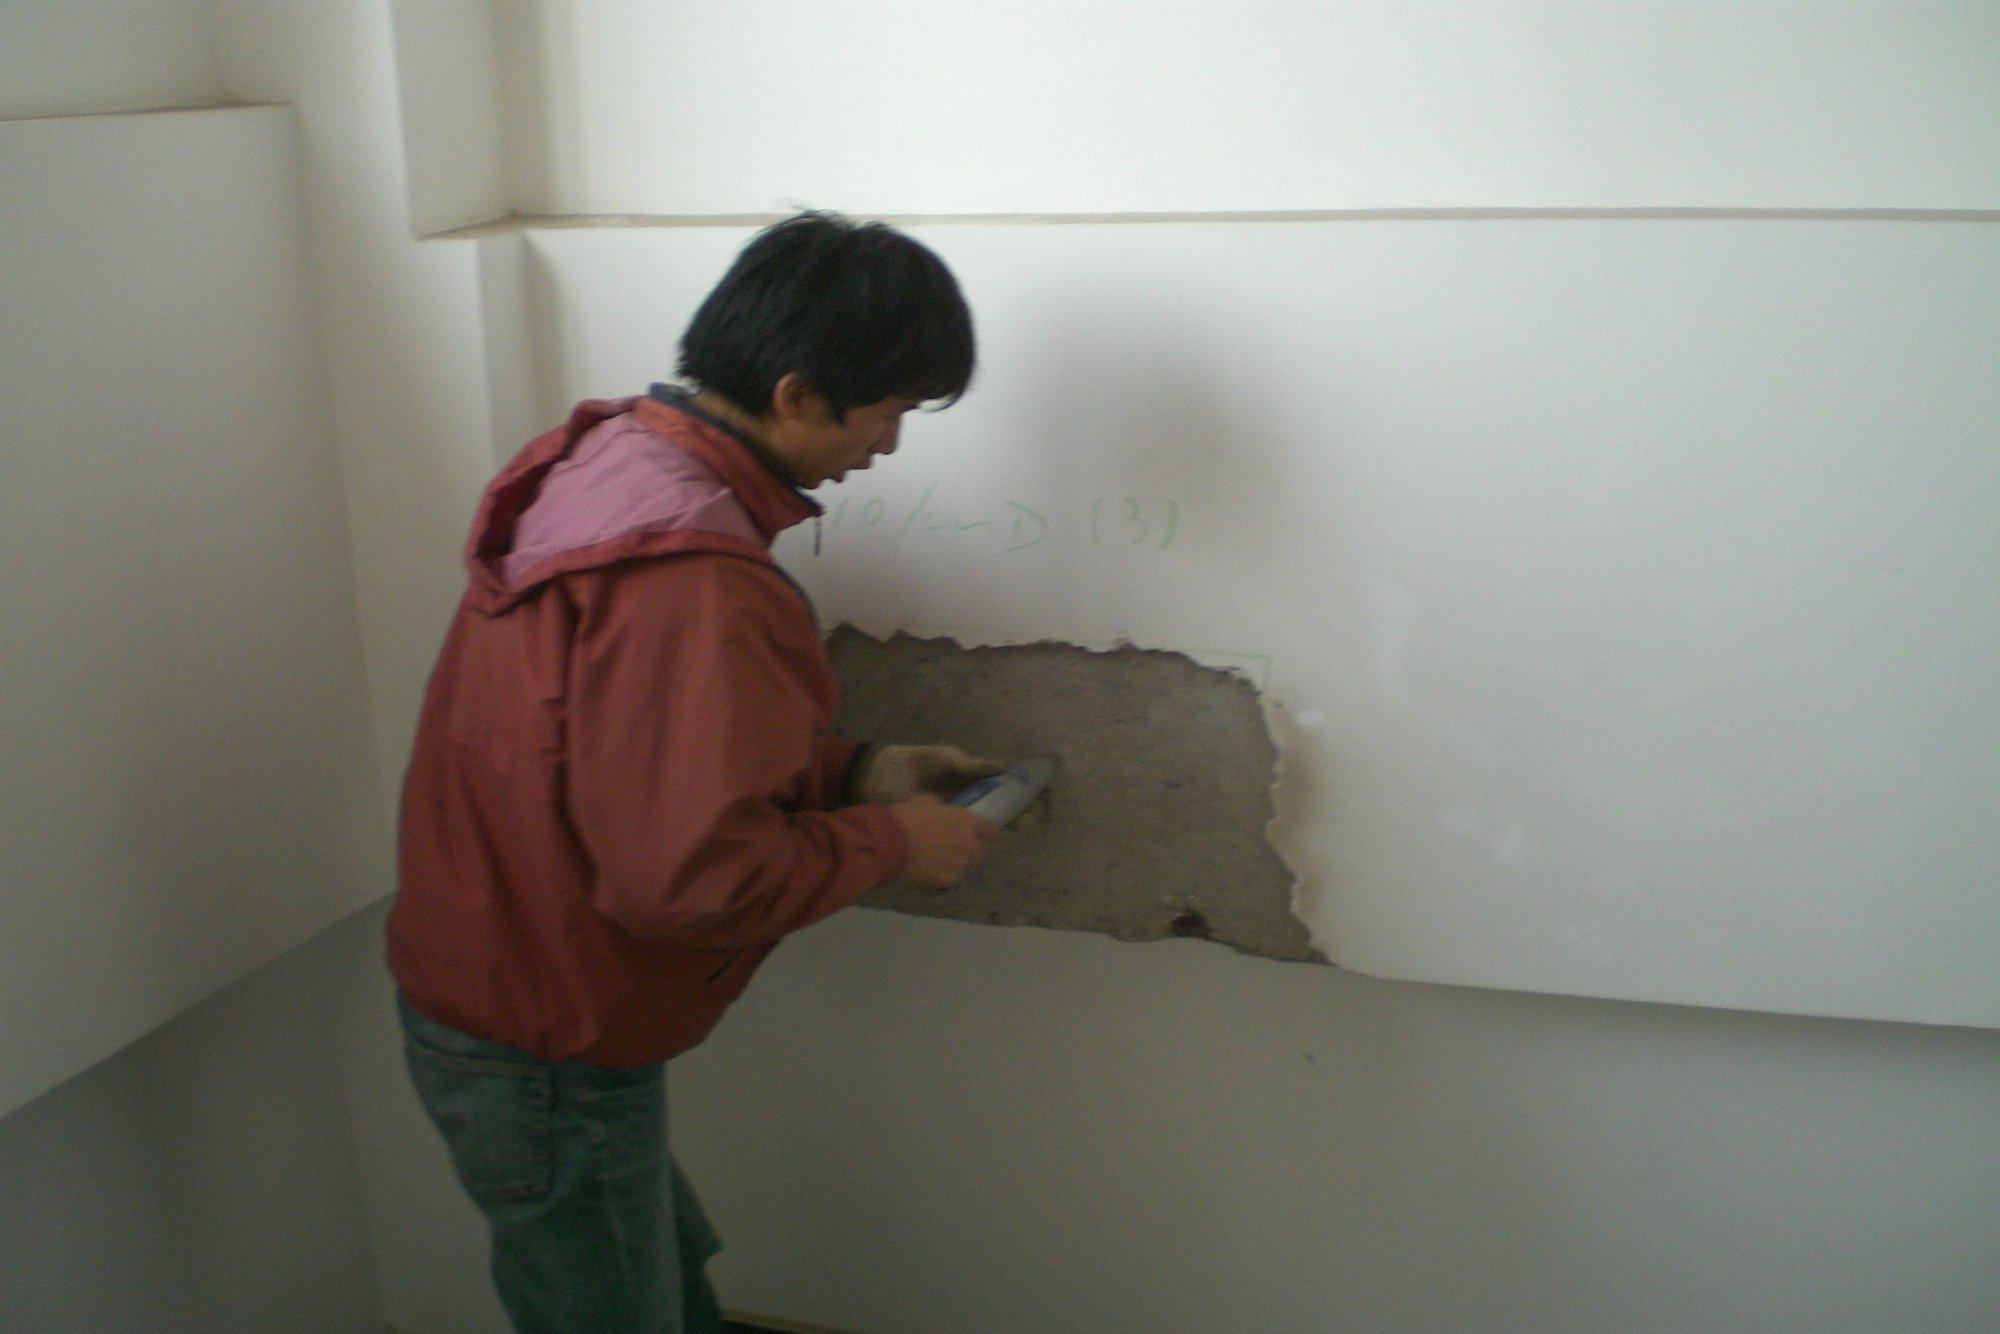 http://www.nthuaimage.com/wenhuayichan/24840.html